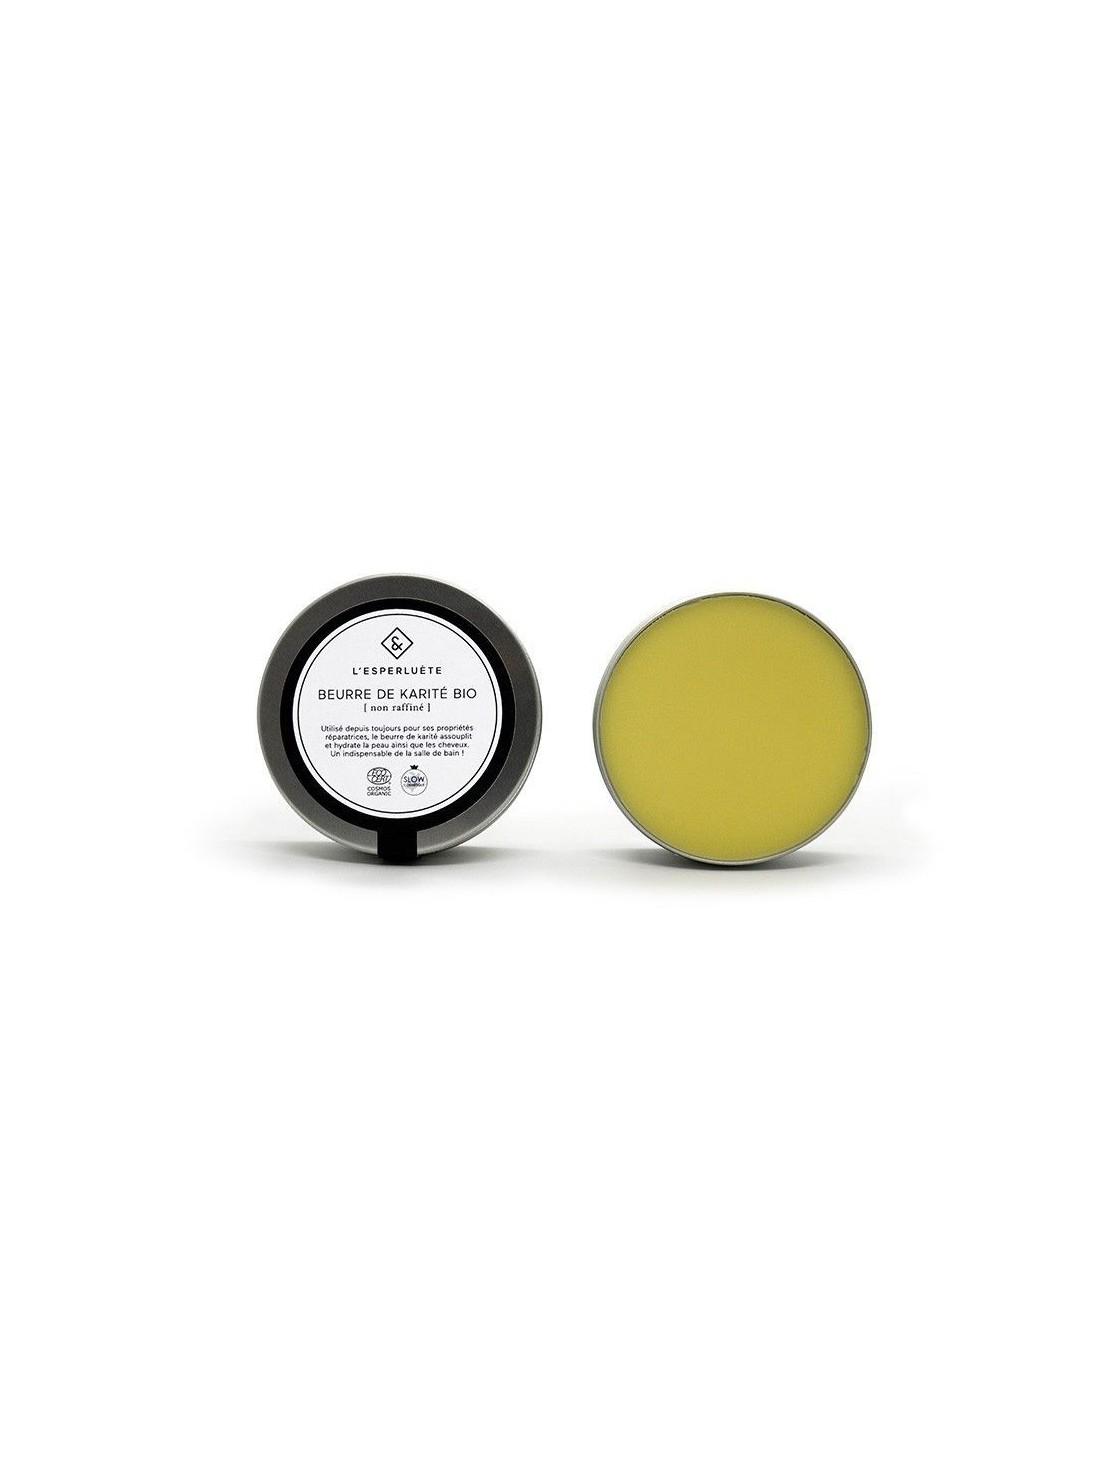 Product photo Organic shea butter 110g L'esperluète